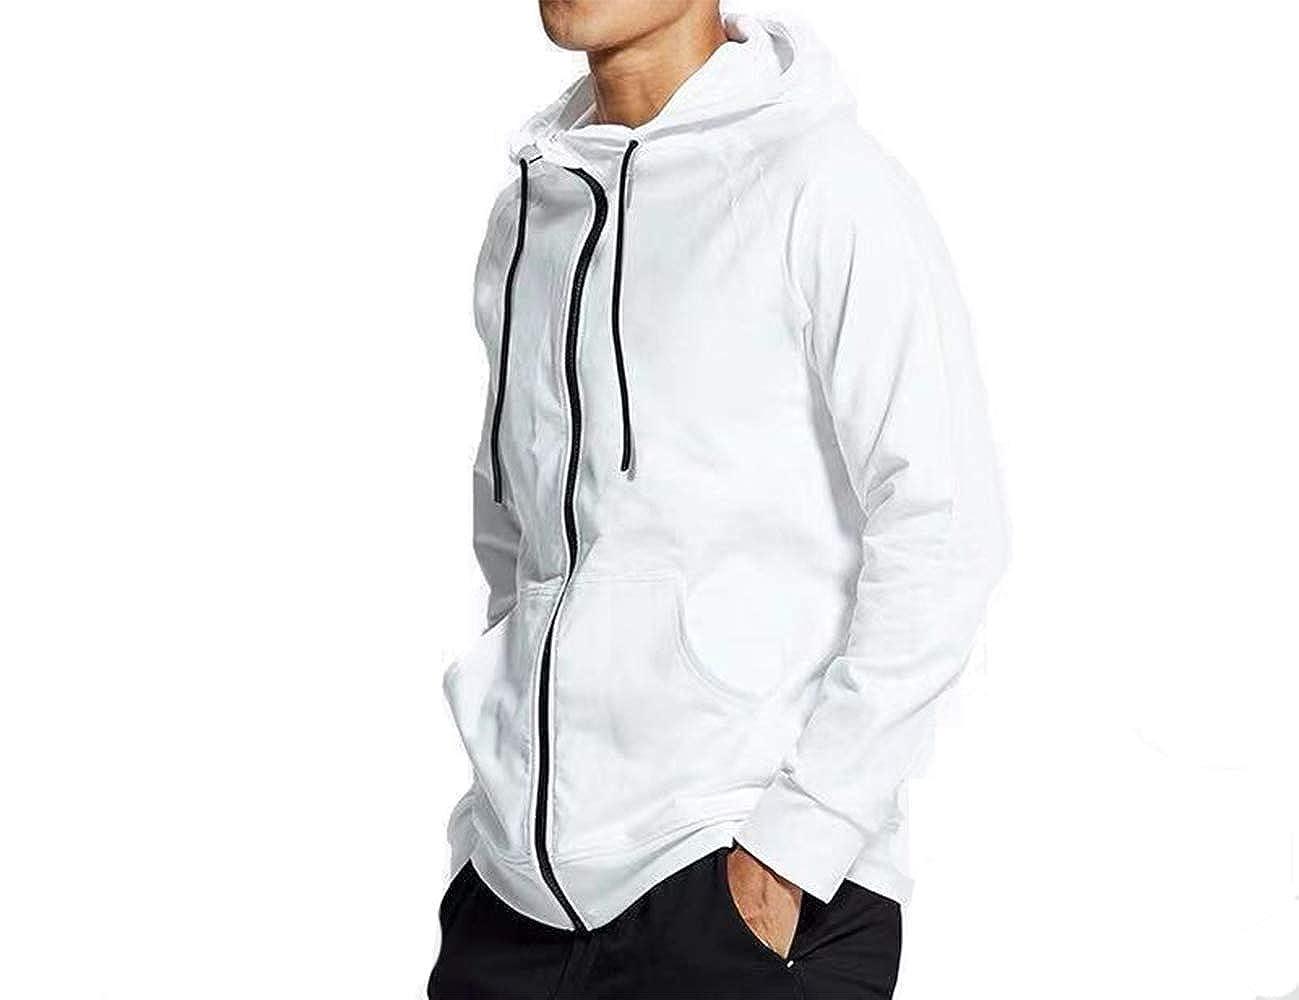 CXB Sports Teens Heavyweight Zip Up Fleece Hoodie Jacket Gym Workout Exercise Long Sleeve